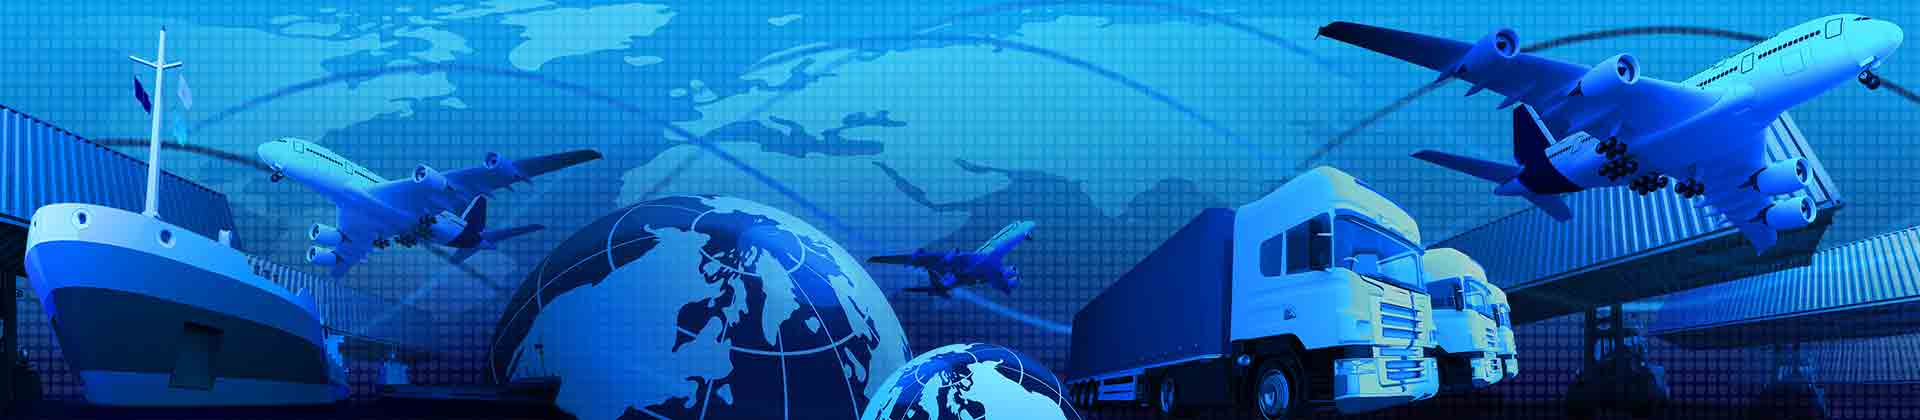 IVG Industrieverpackungs- und Transportgesellschaft mbH